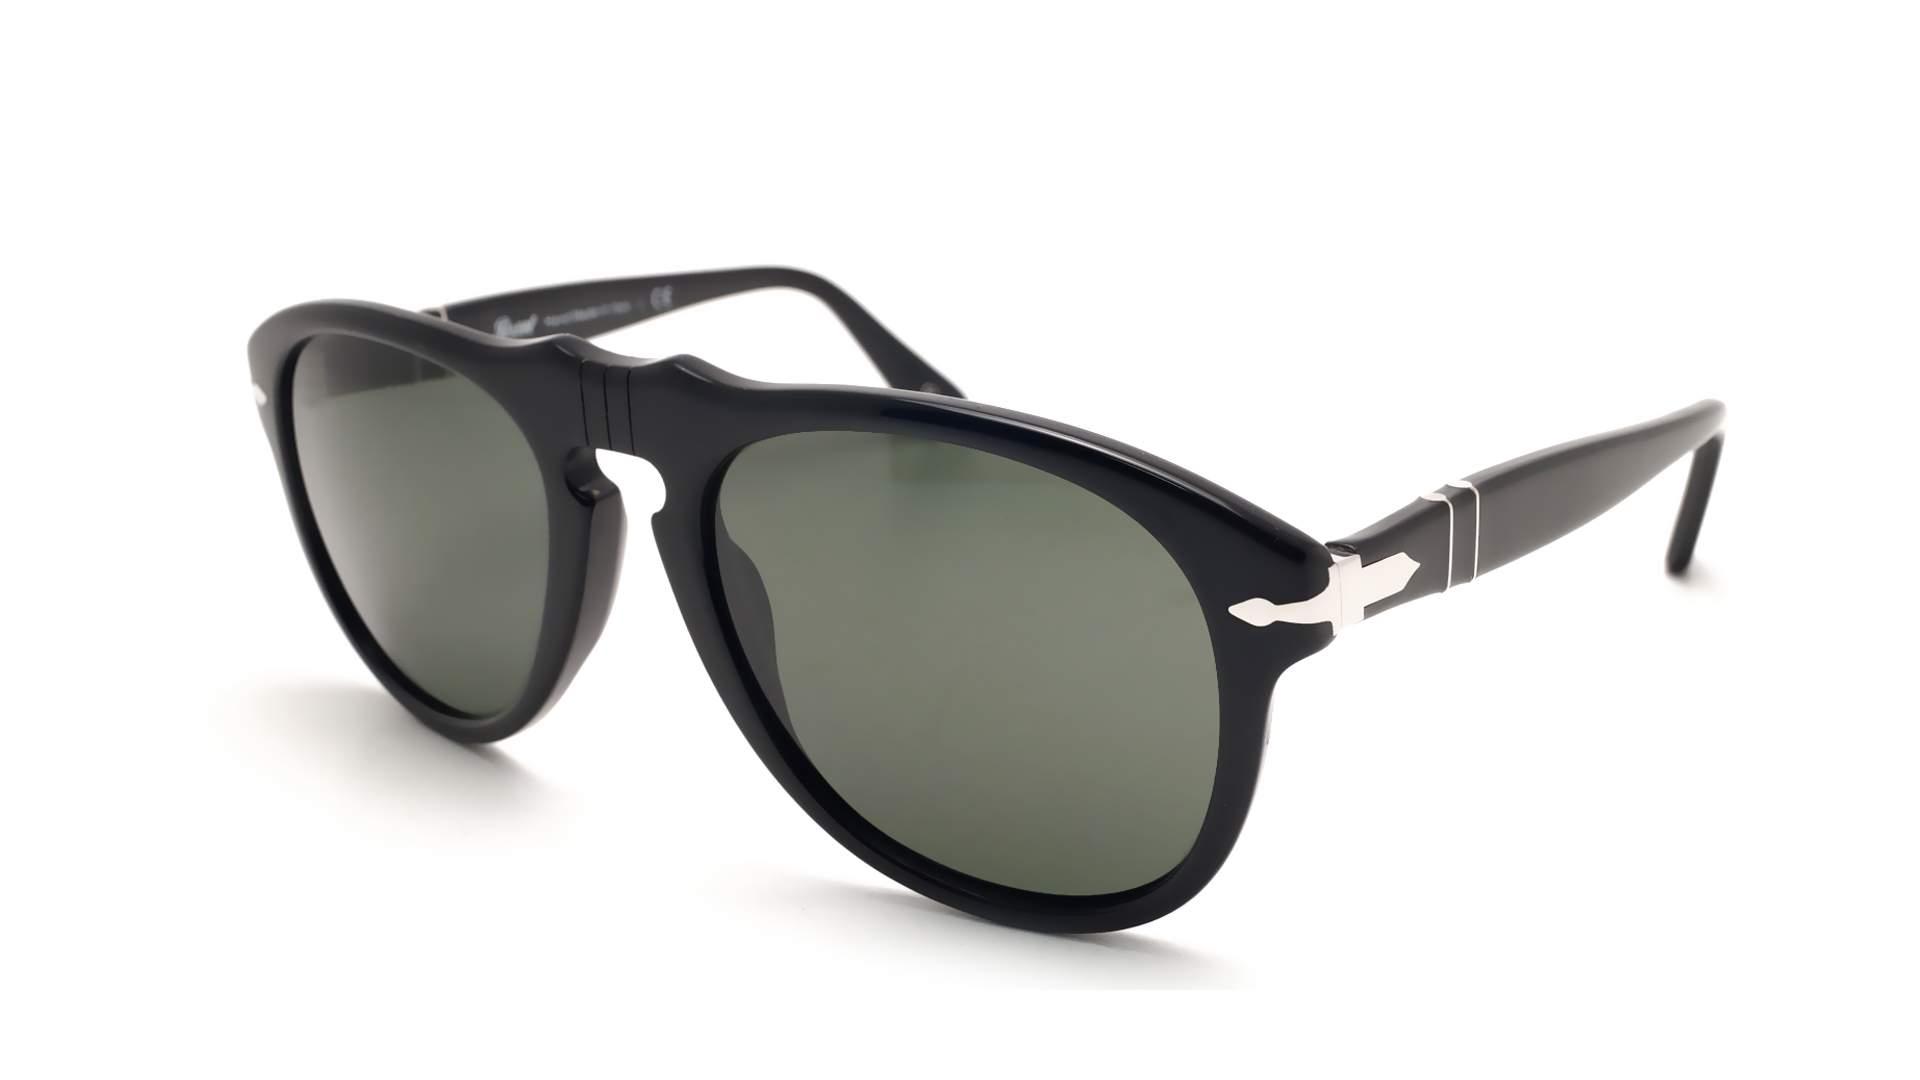 d57f293fa1aa4 Sunglasses Persol PO0649 95 31 54-20 medium Black